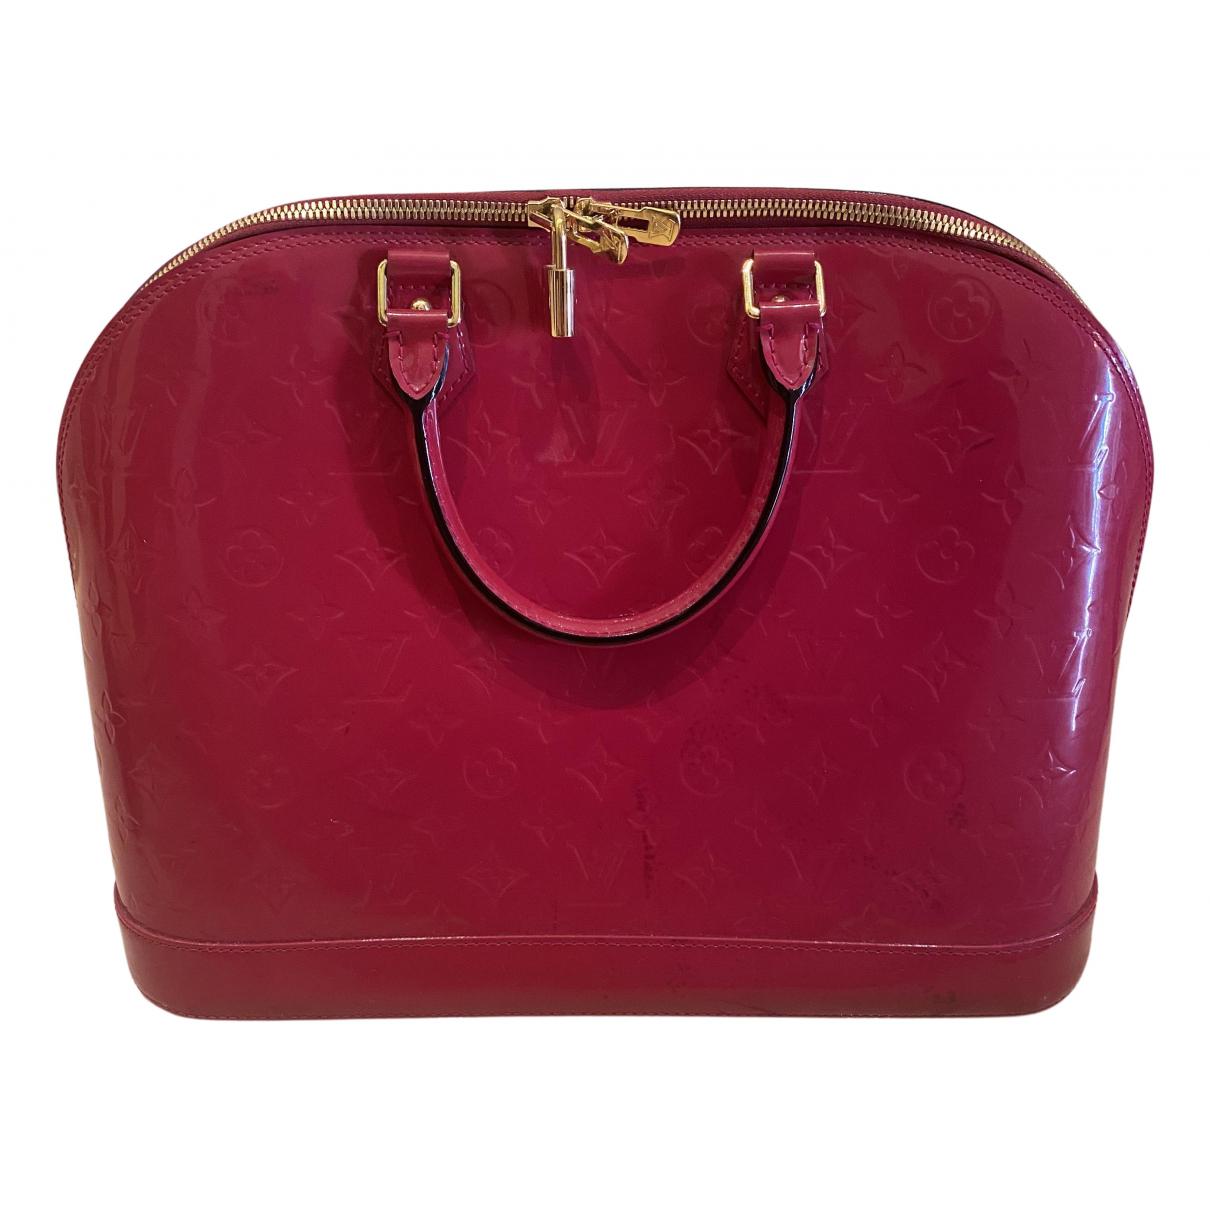 Louis Vuitton Alma Red Patent leather handbag for Women N